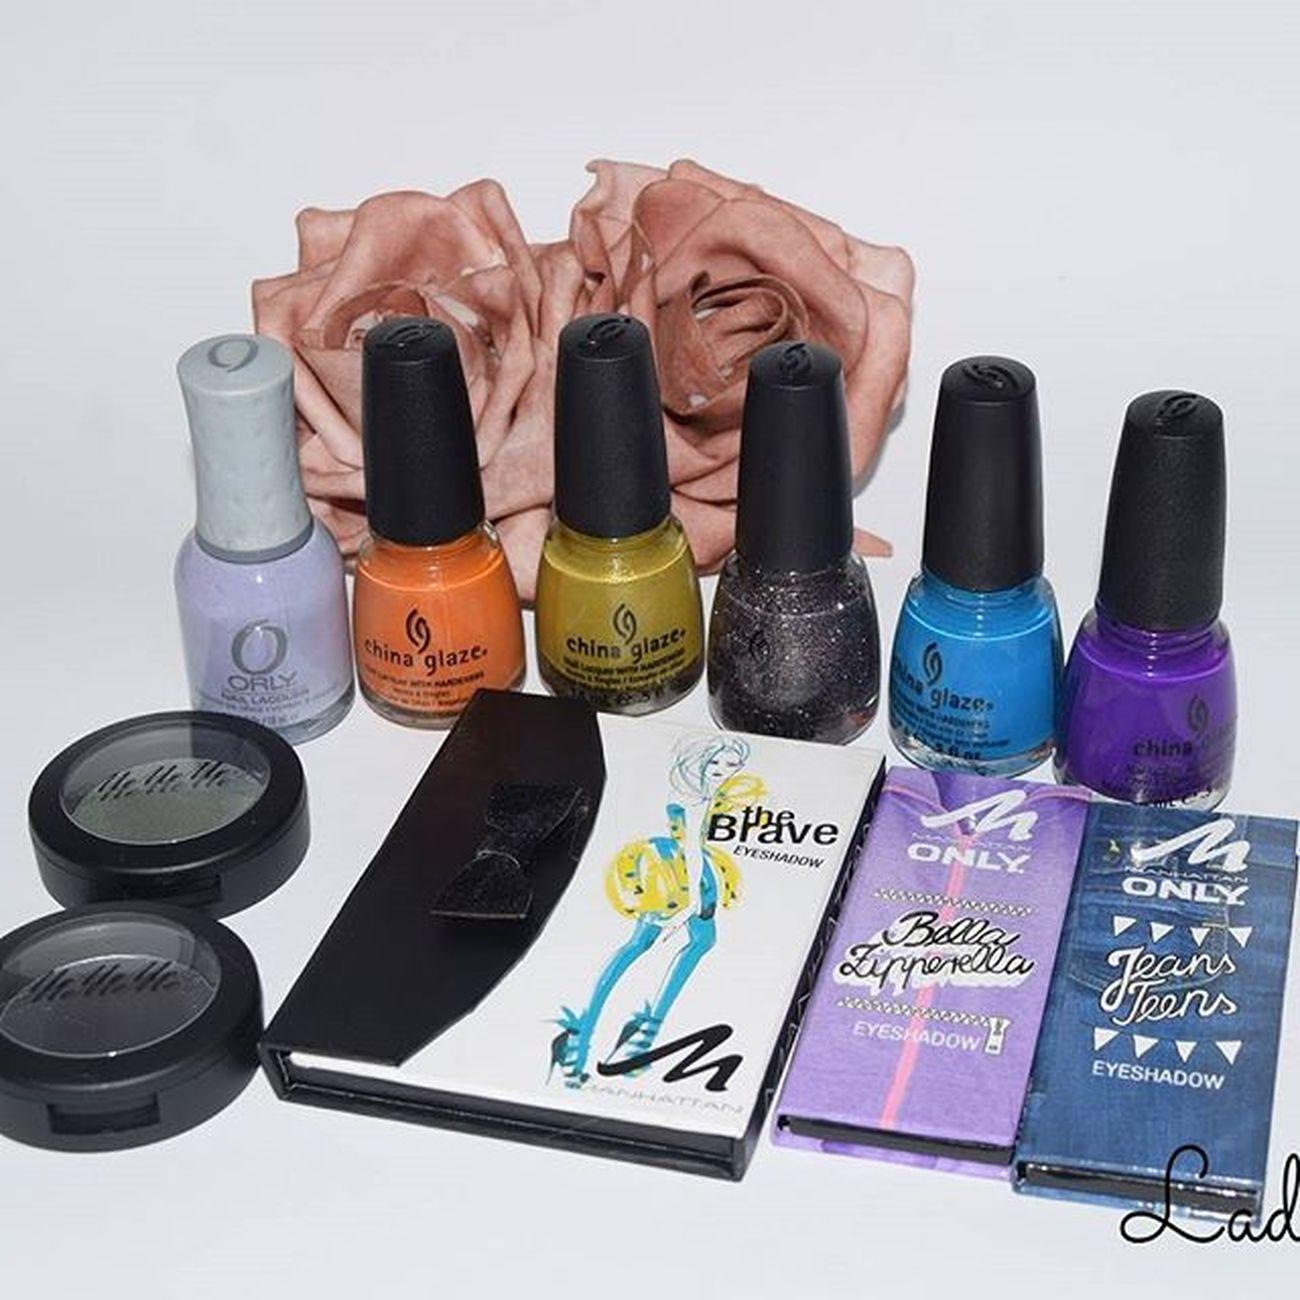 Meine Kosmetik4less Bestellung vom letzten Monat. Mememe Mono Eyeshadow Manhattan Chinaglaze Orlynails Orly Naillacquer Nagellacksucht Nails Nailsswag Haul Kosmetik4lesshaul Shooping Online  Cosmetic Beautyblogger_de Beautyblogger Bloggergram Blogger